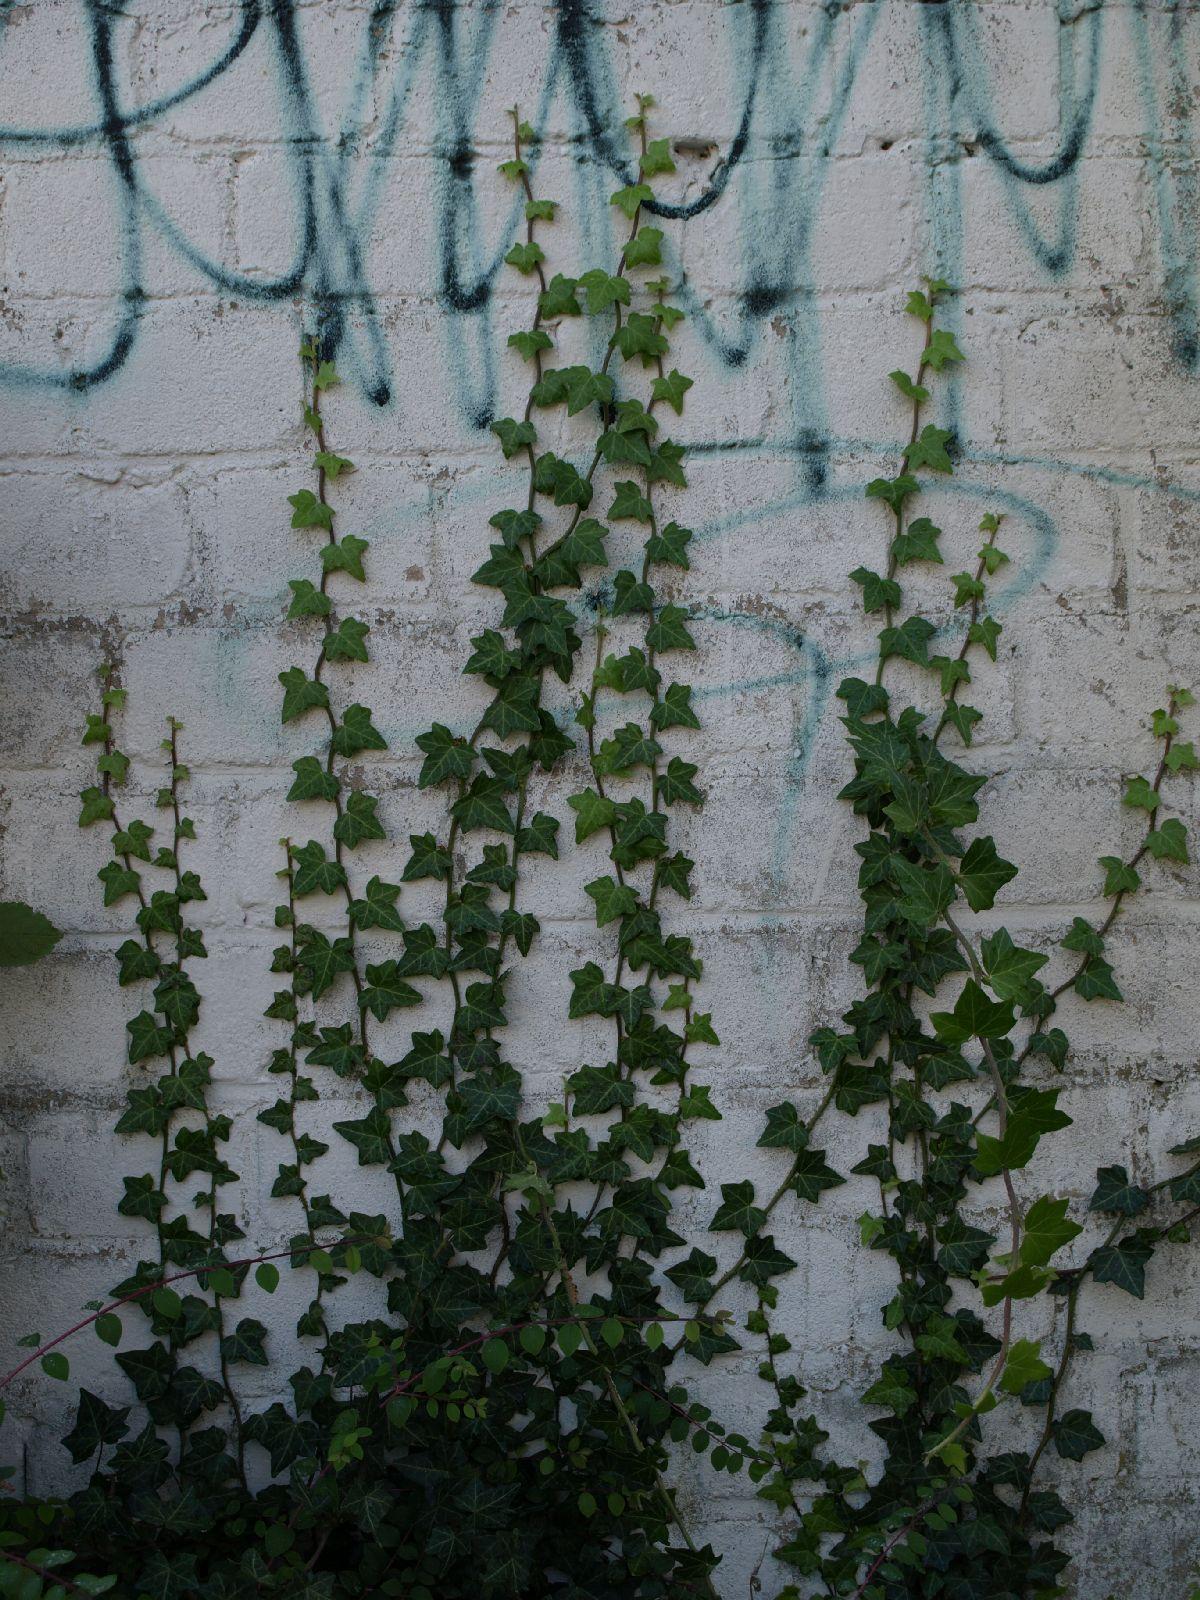 Pflanzen-Baum-Foto_Textur_B_PA035669